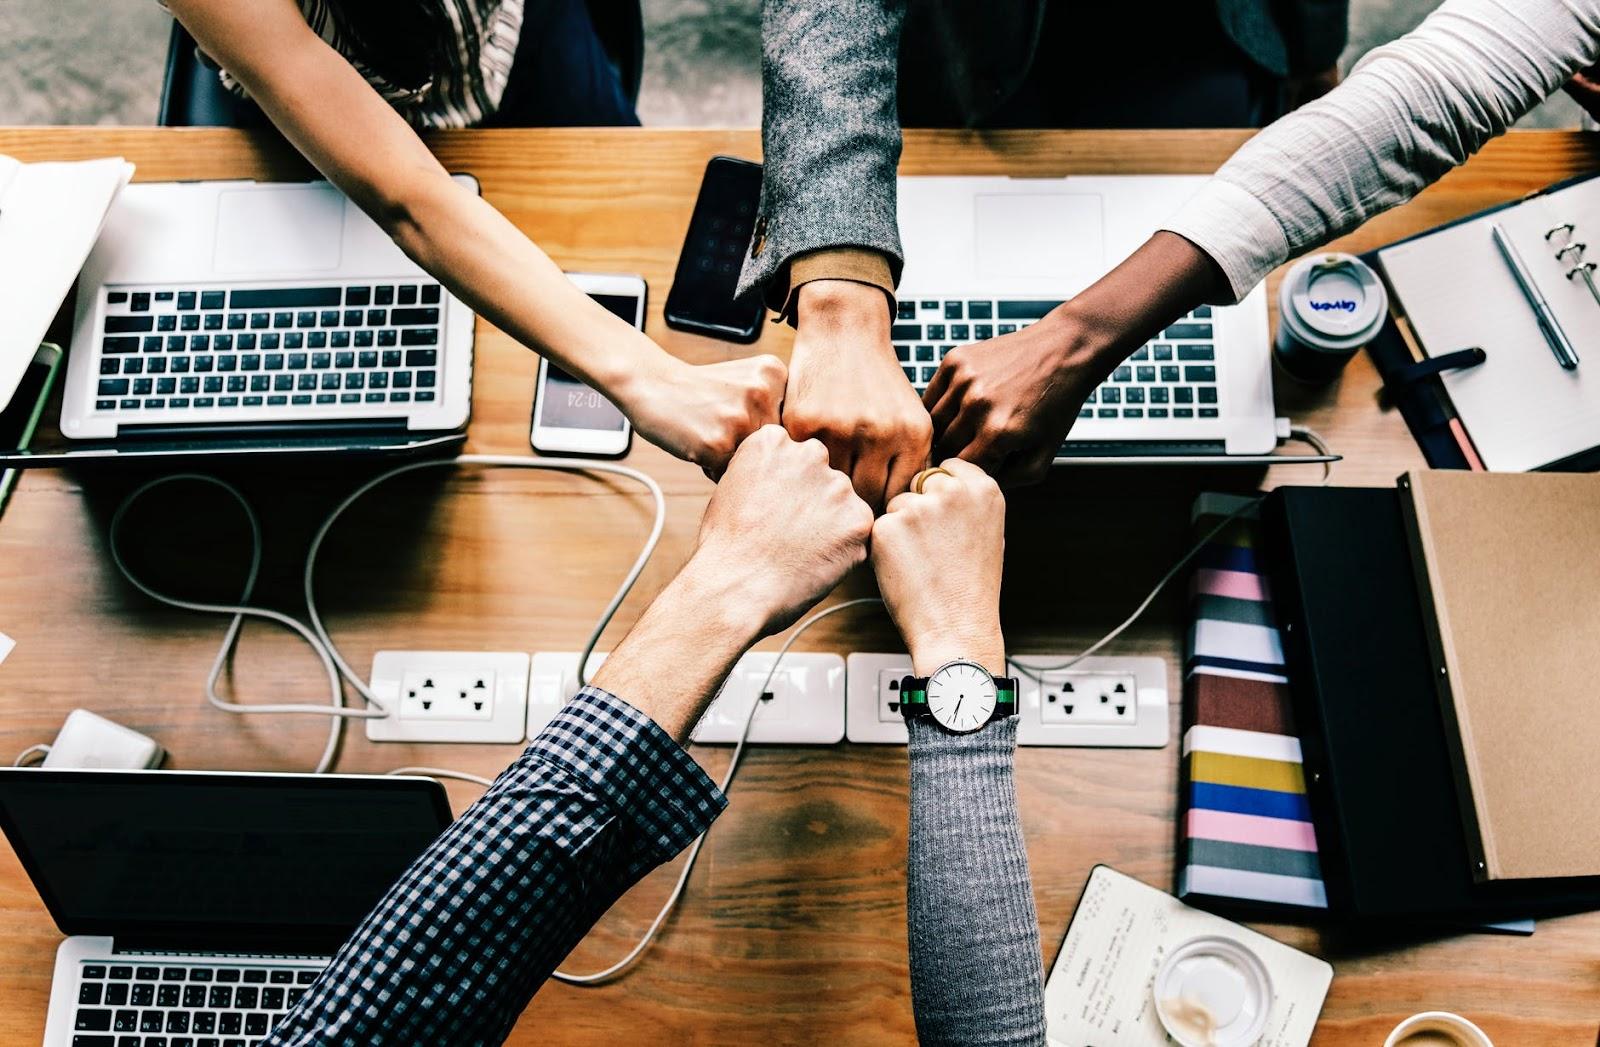 Teamwork for event planning